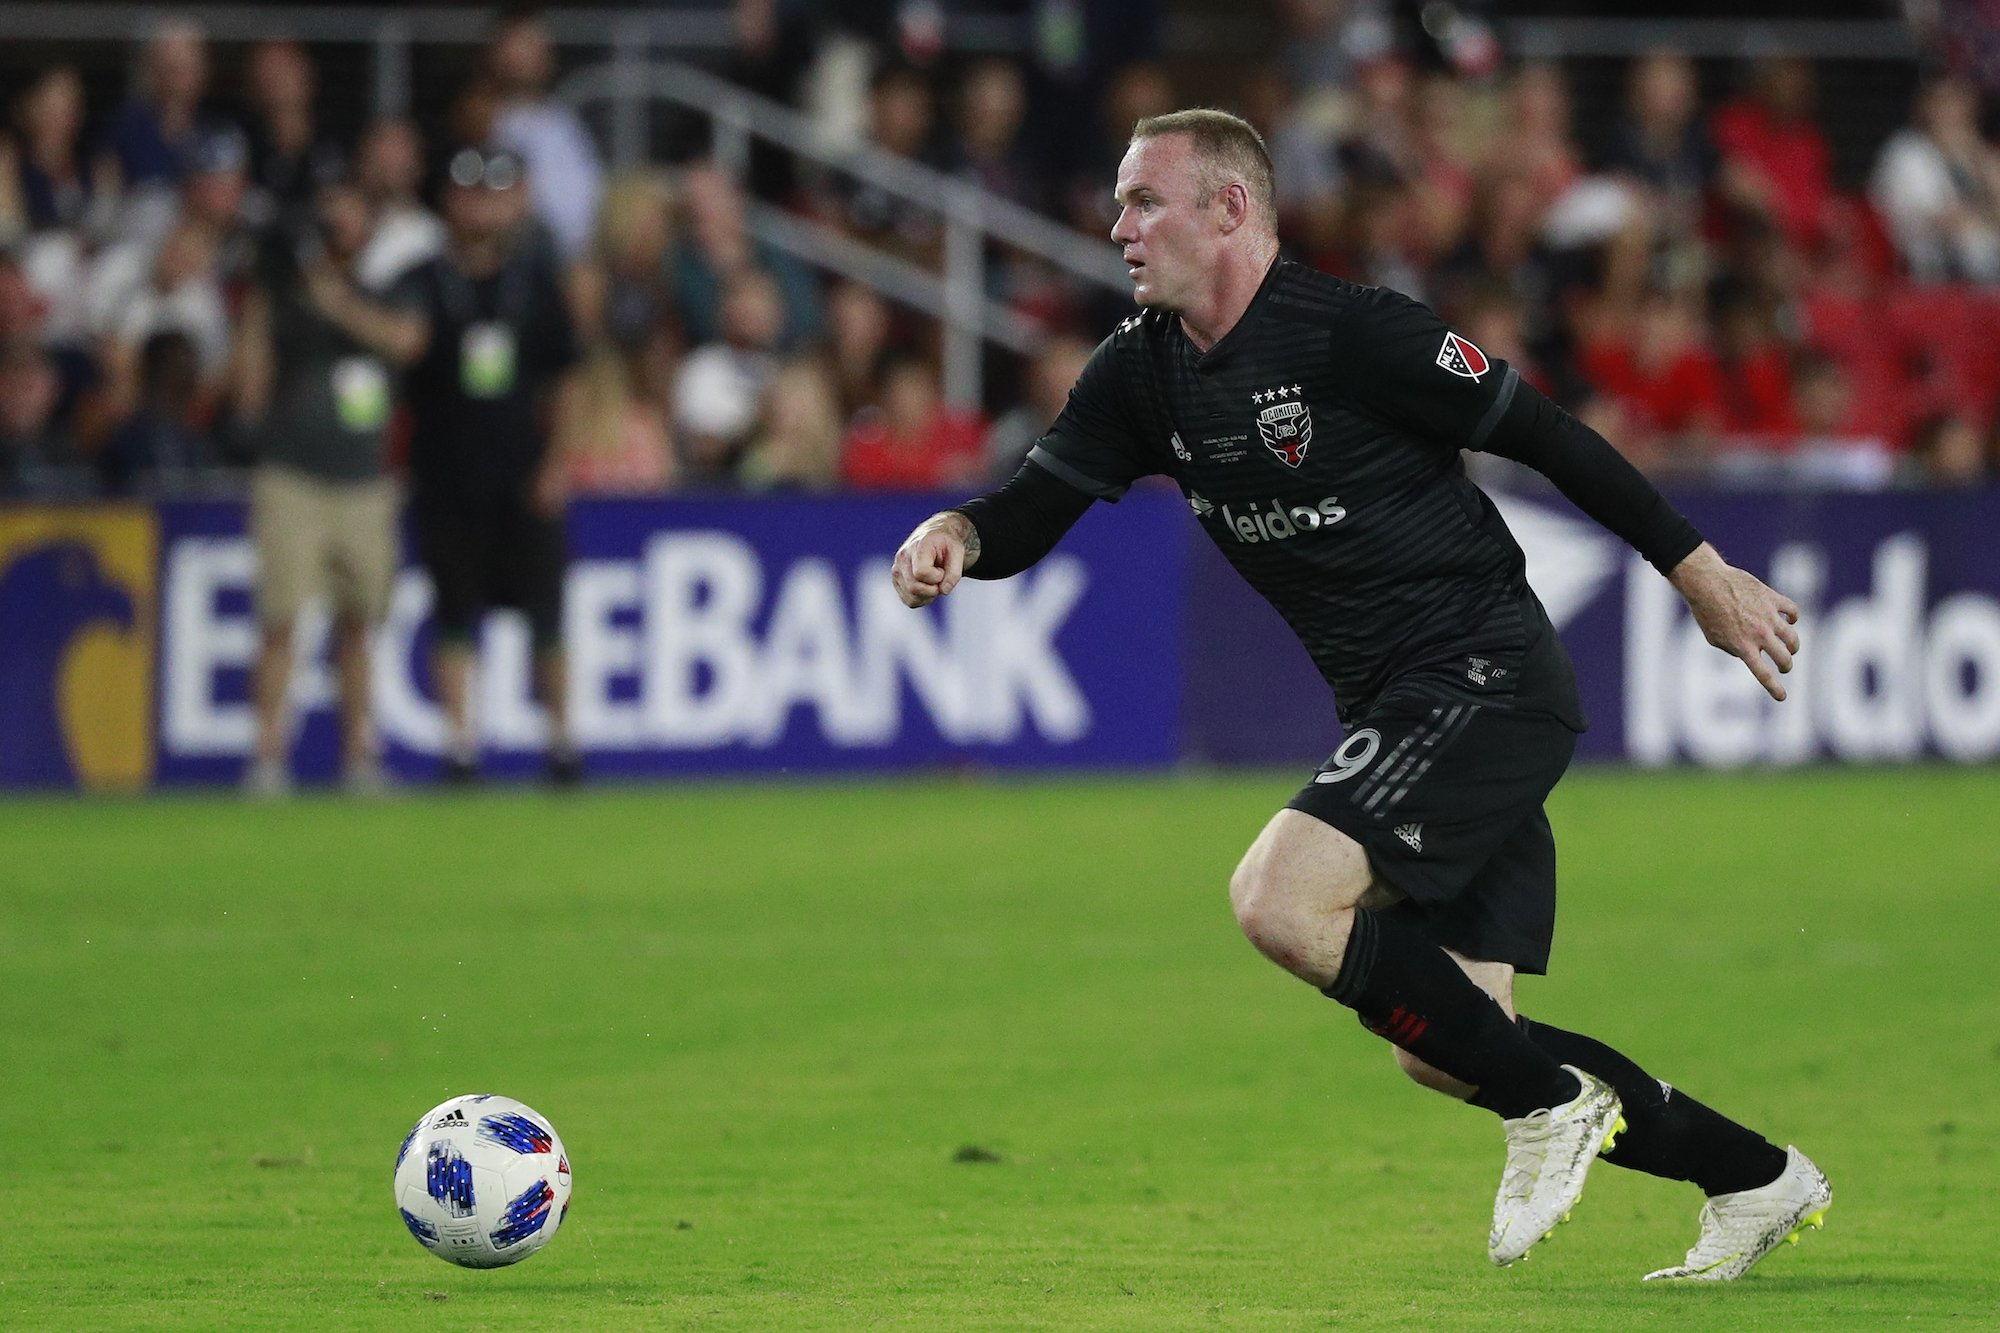 Gagal Eksekusi Penalty, Wayne Rooney Kecewa